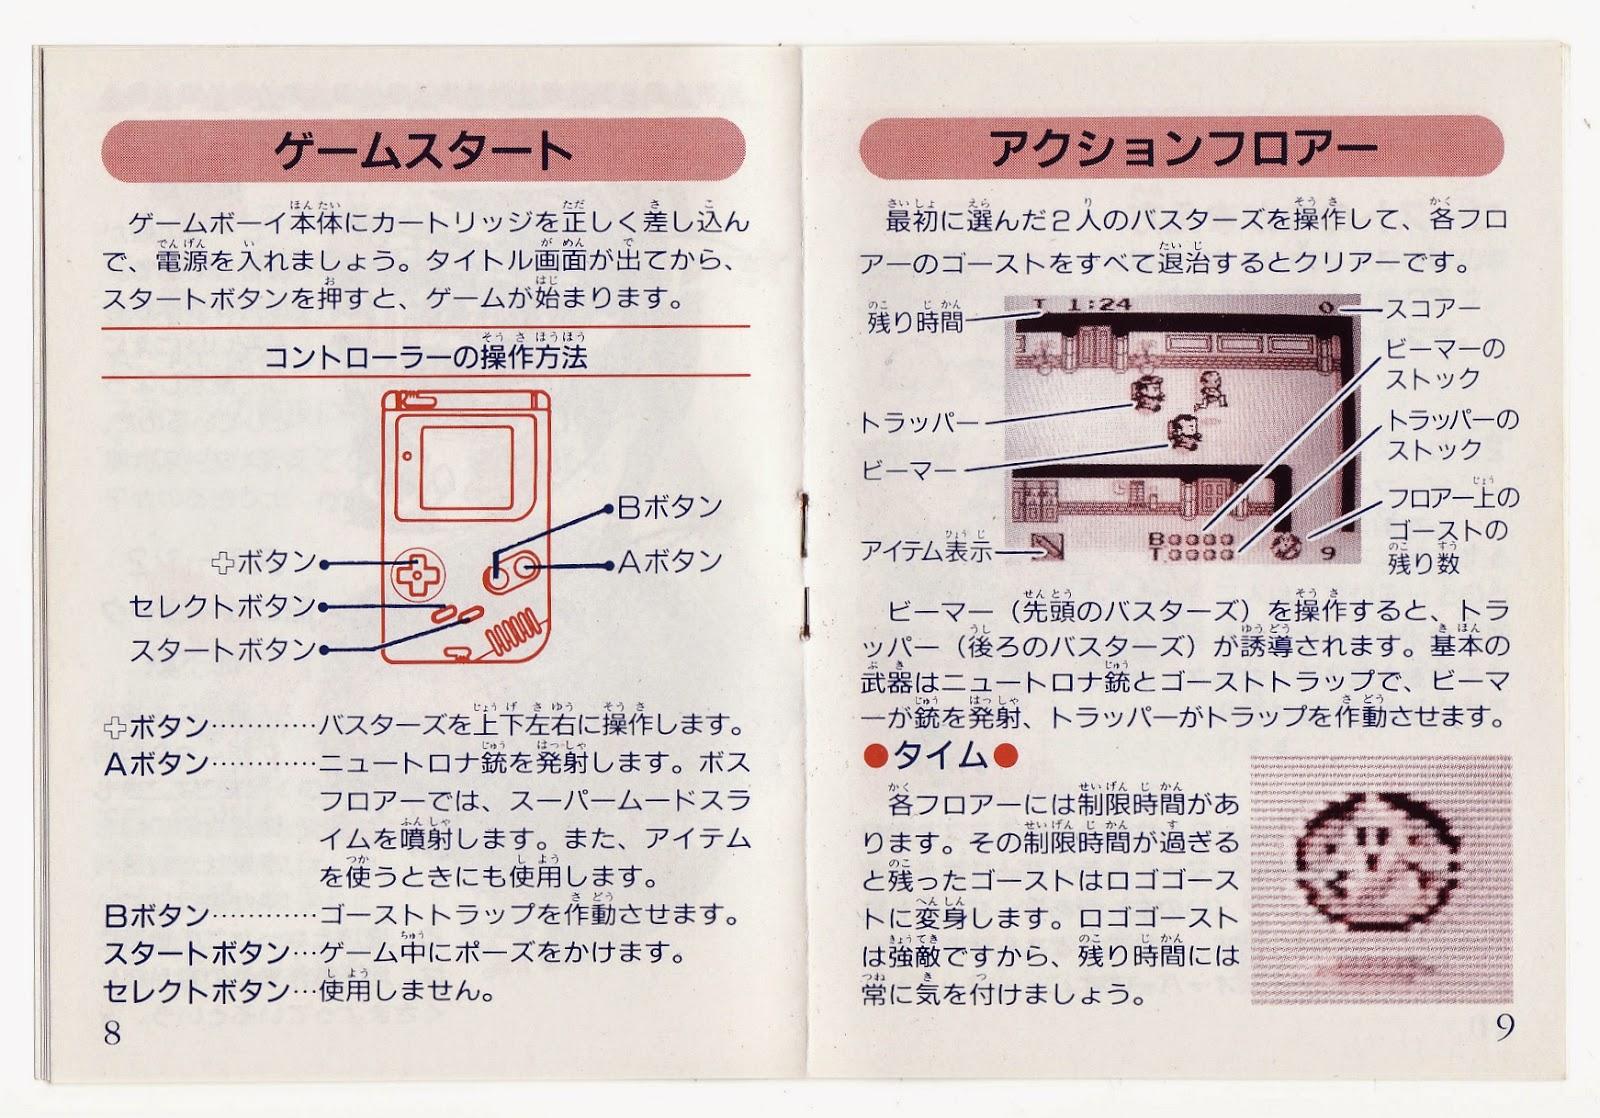 Gameboy manuals